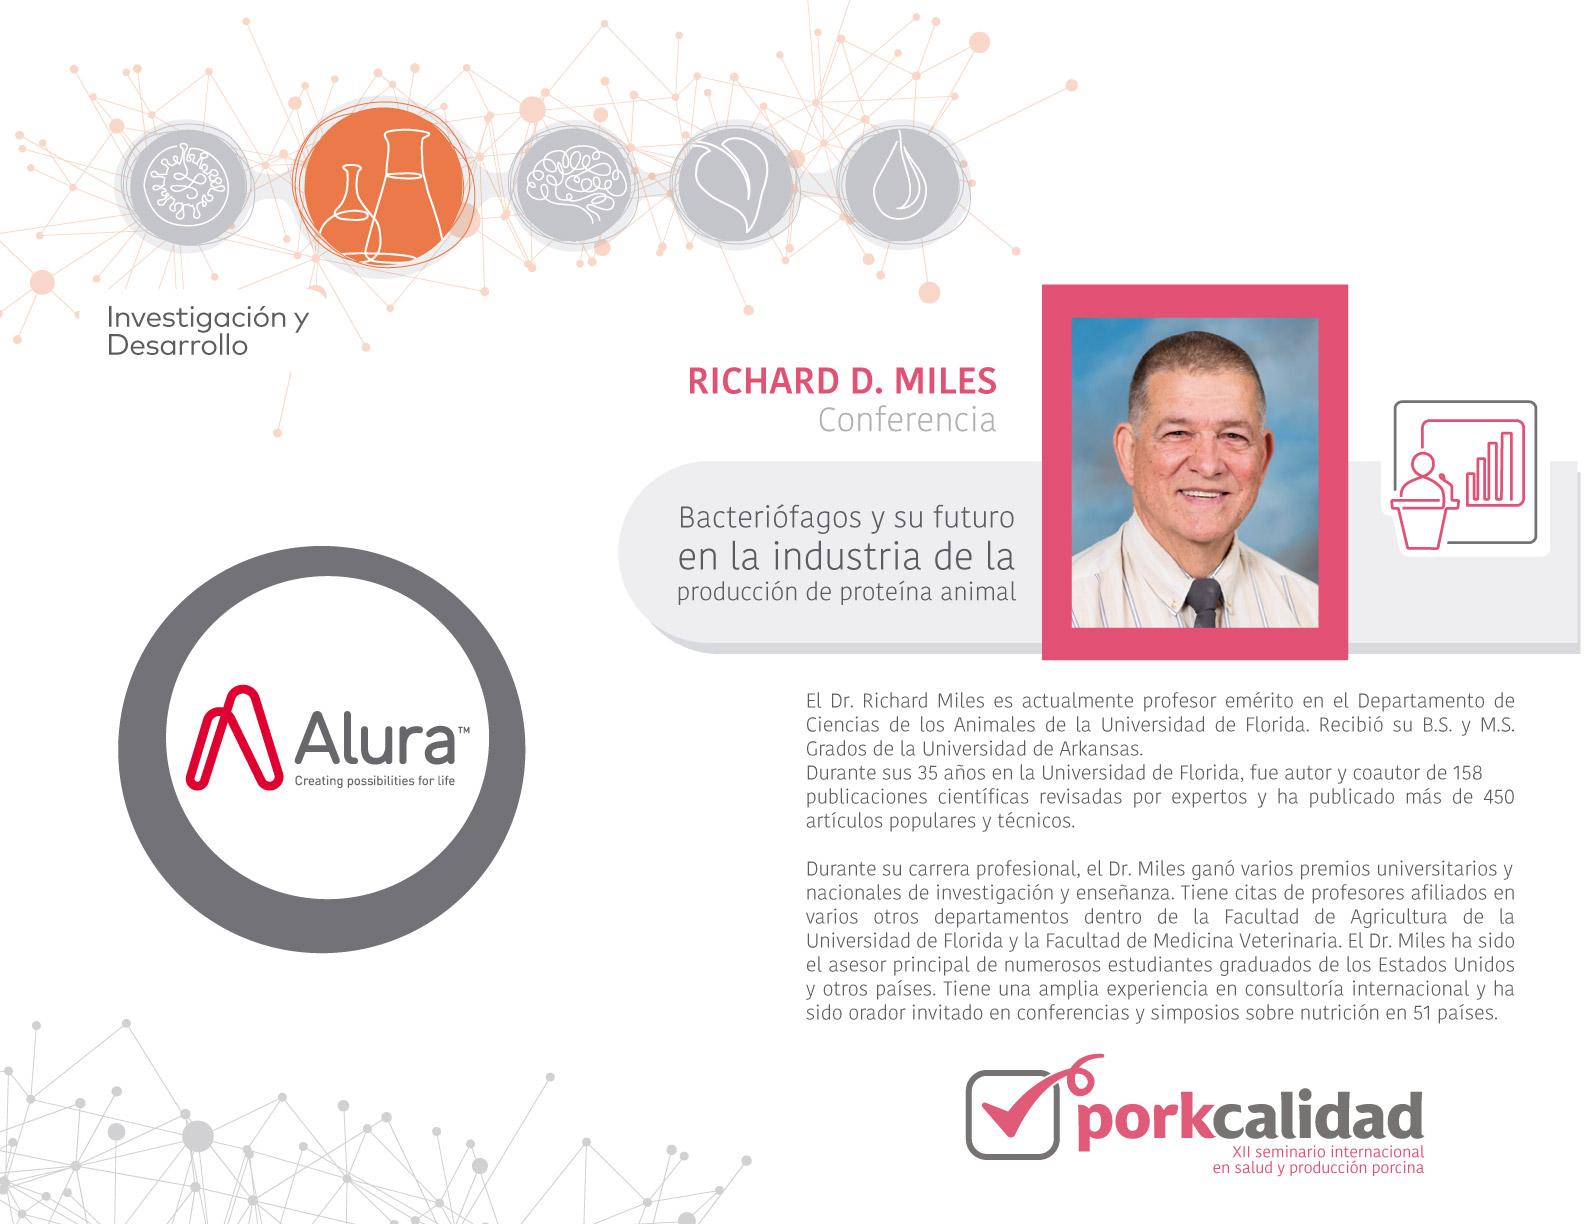 Porkcalidad2019-Alura